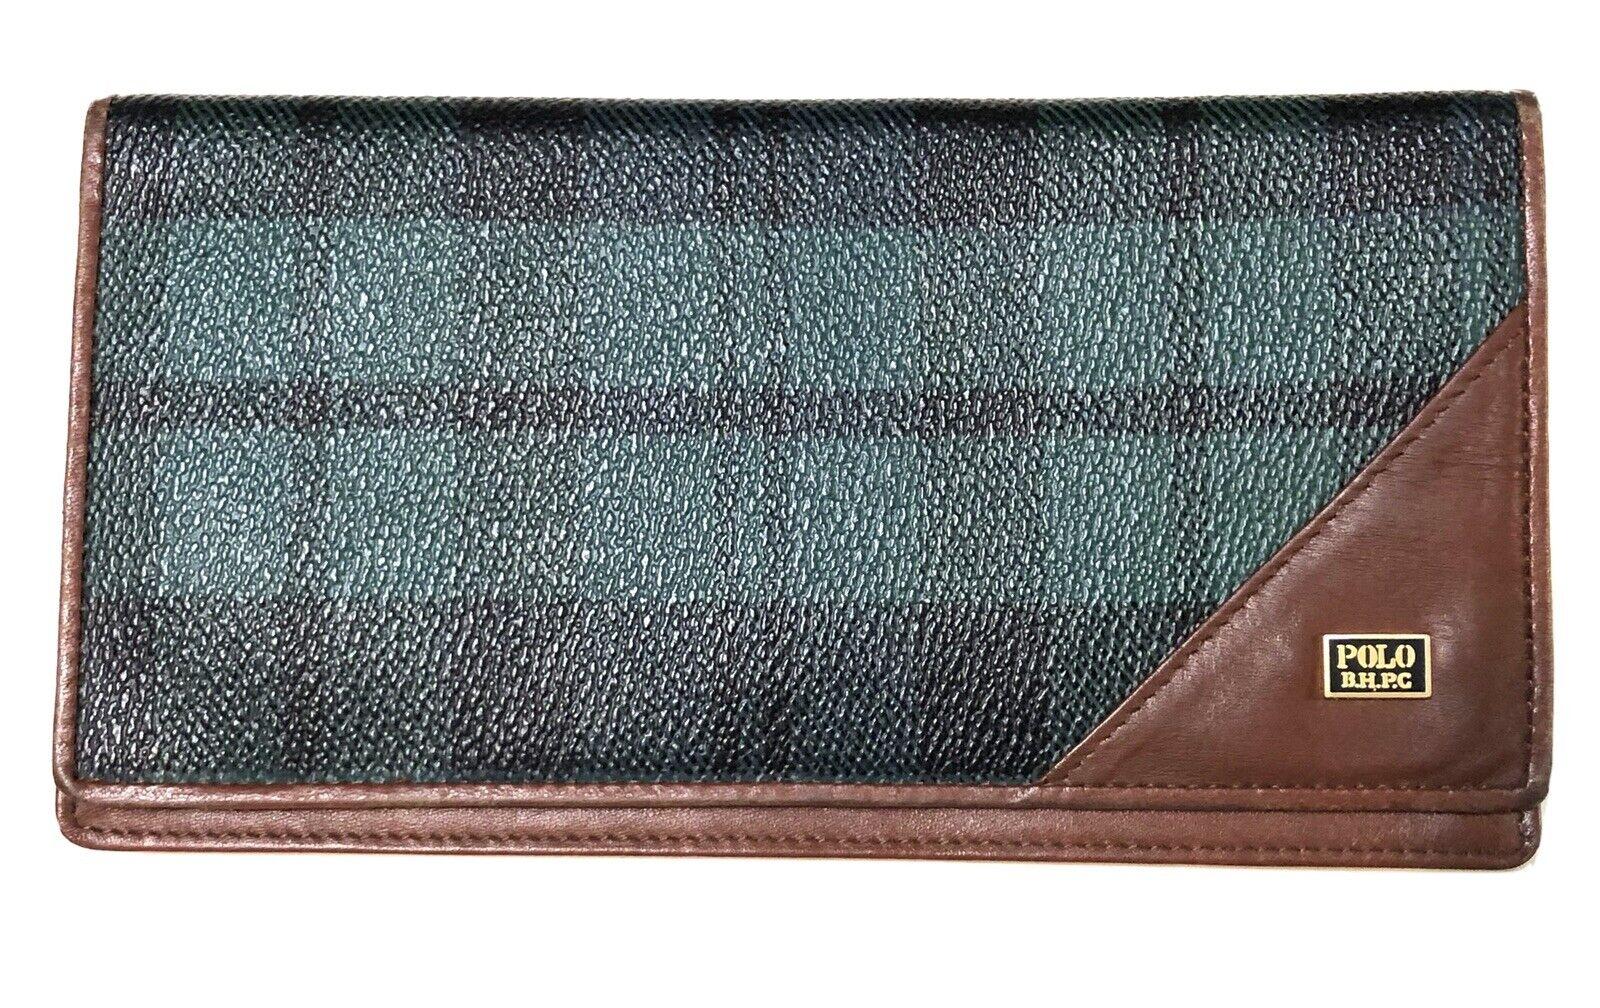 Beverly Hills Polo Club Ralph Lauren Tartan Plaid Leather Canvas Wallet 1982